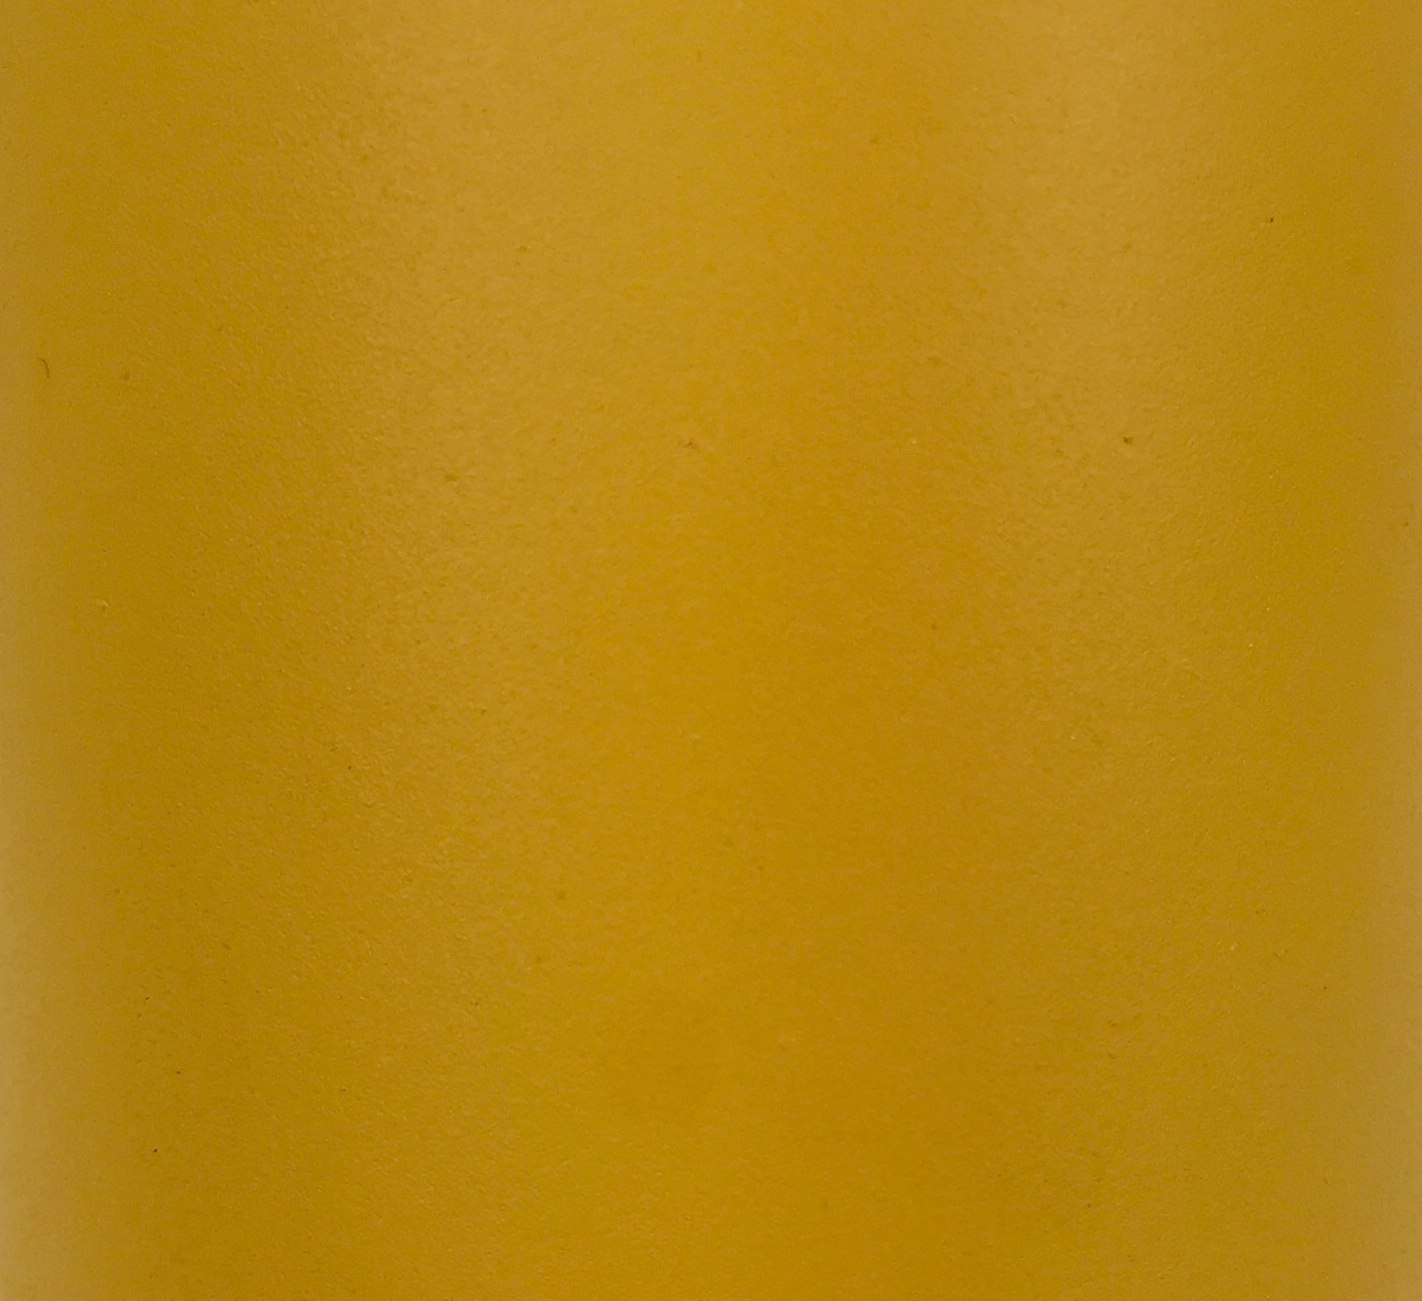 2022 Golden Yellow